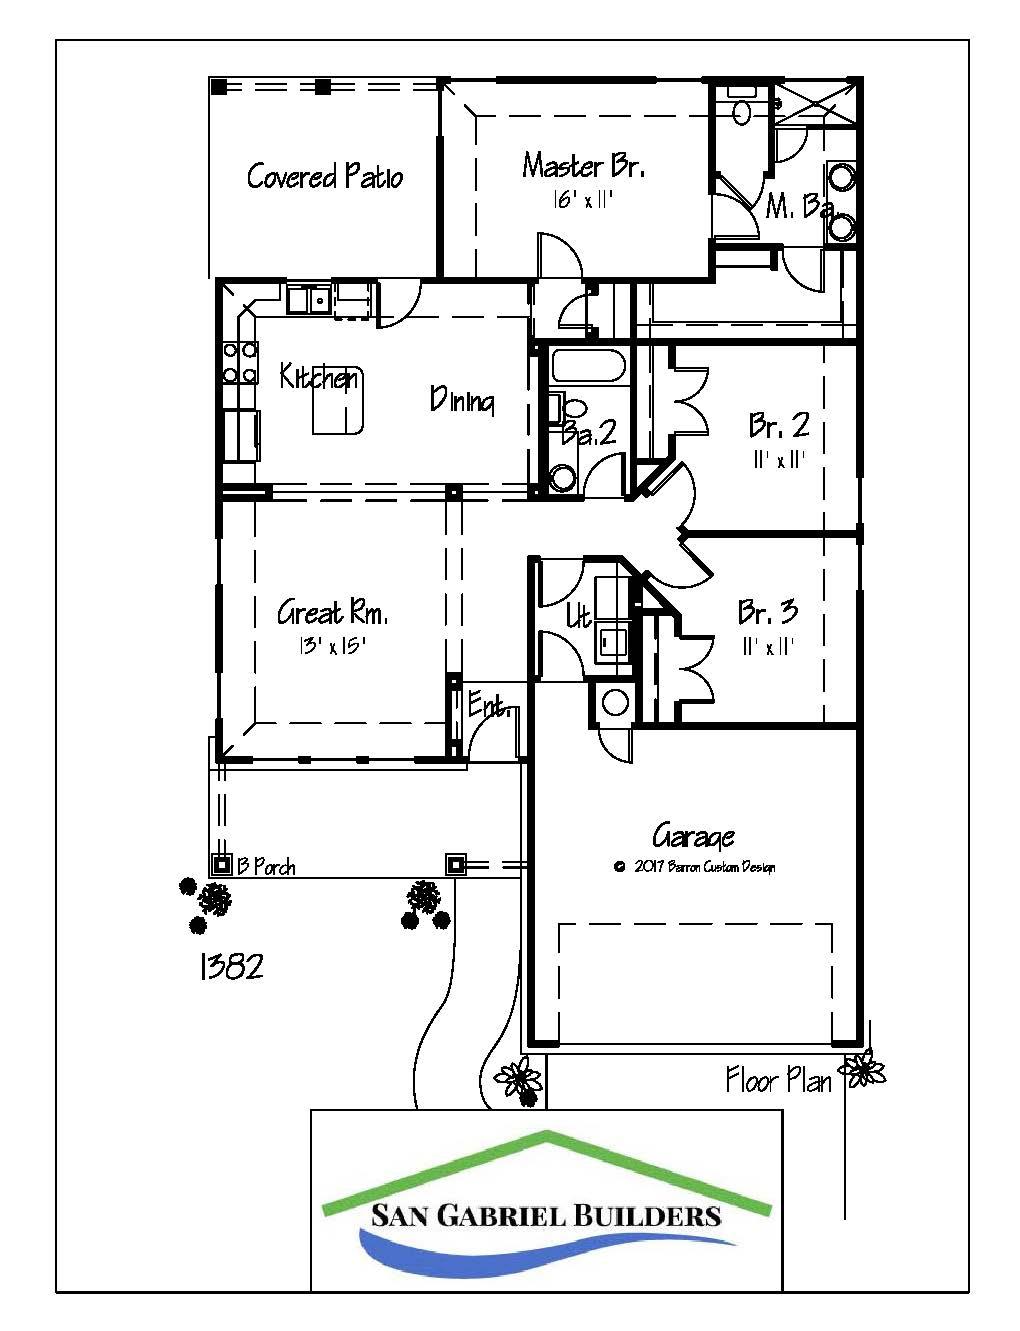 1321 Primrose, Marble Falls Floor Plan